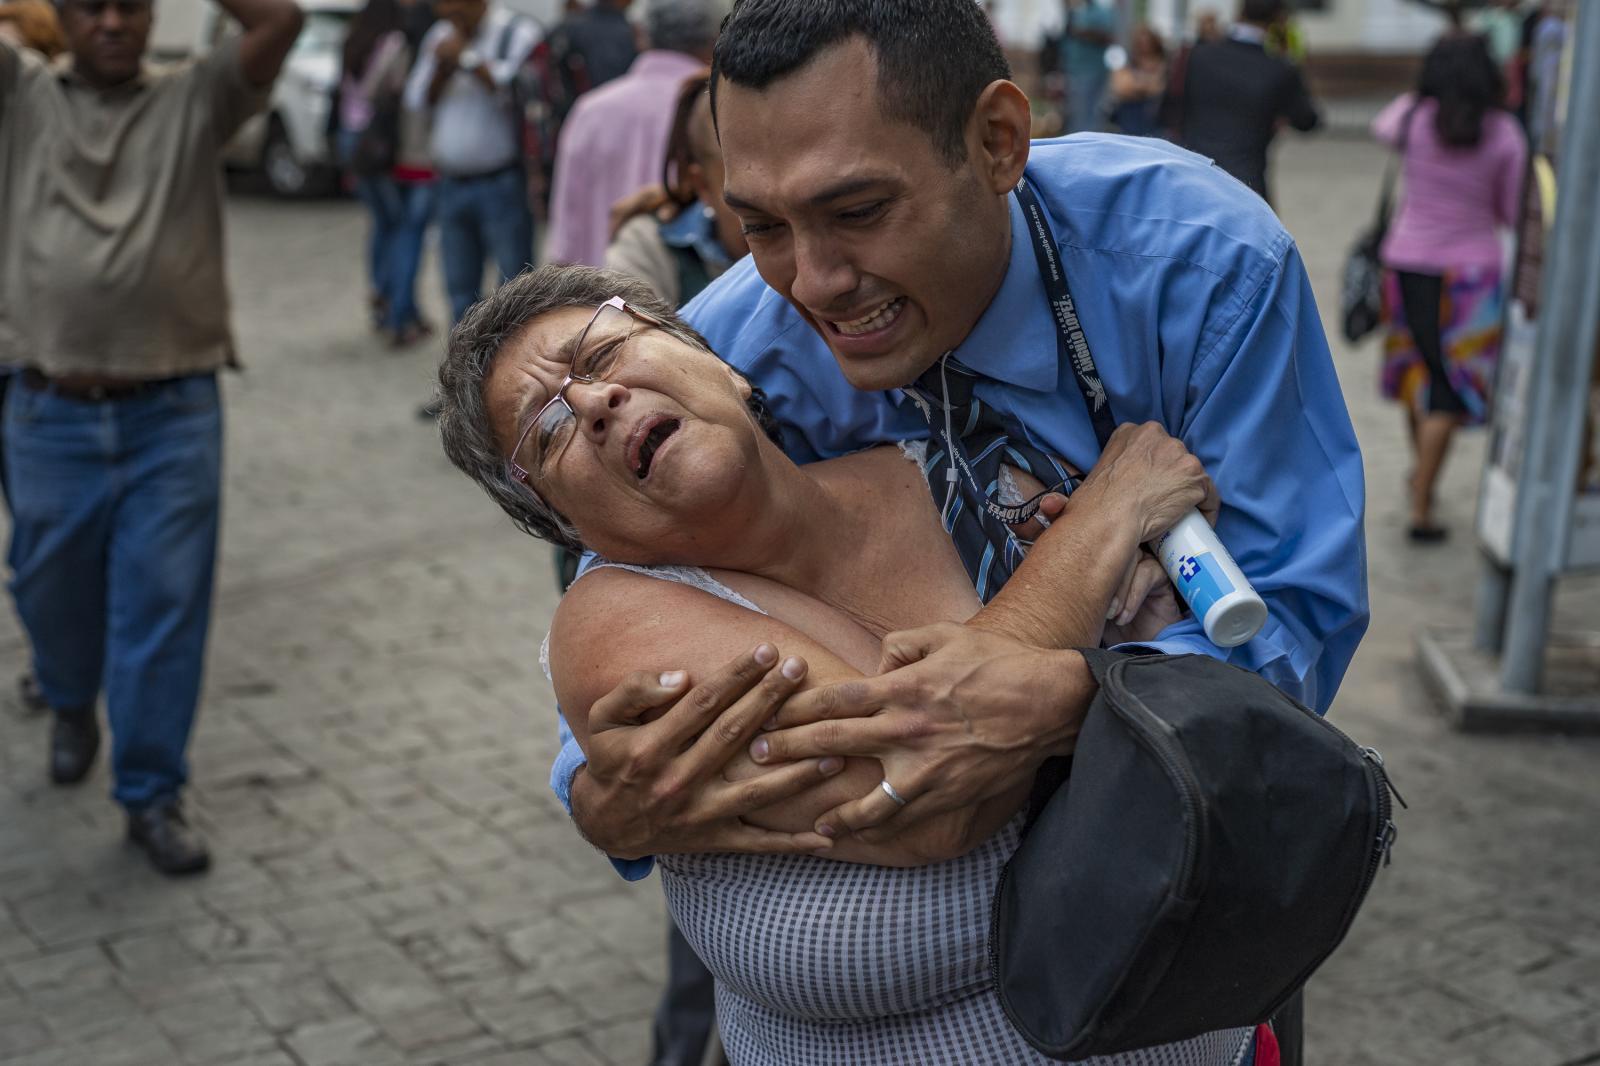 Photography image - Loading MUERTE_DE_CHAVEZ-3.jpg